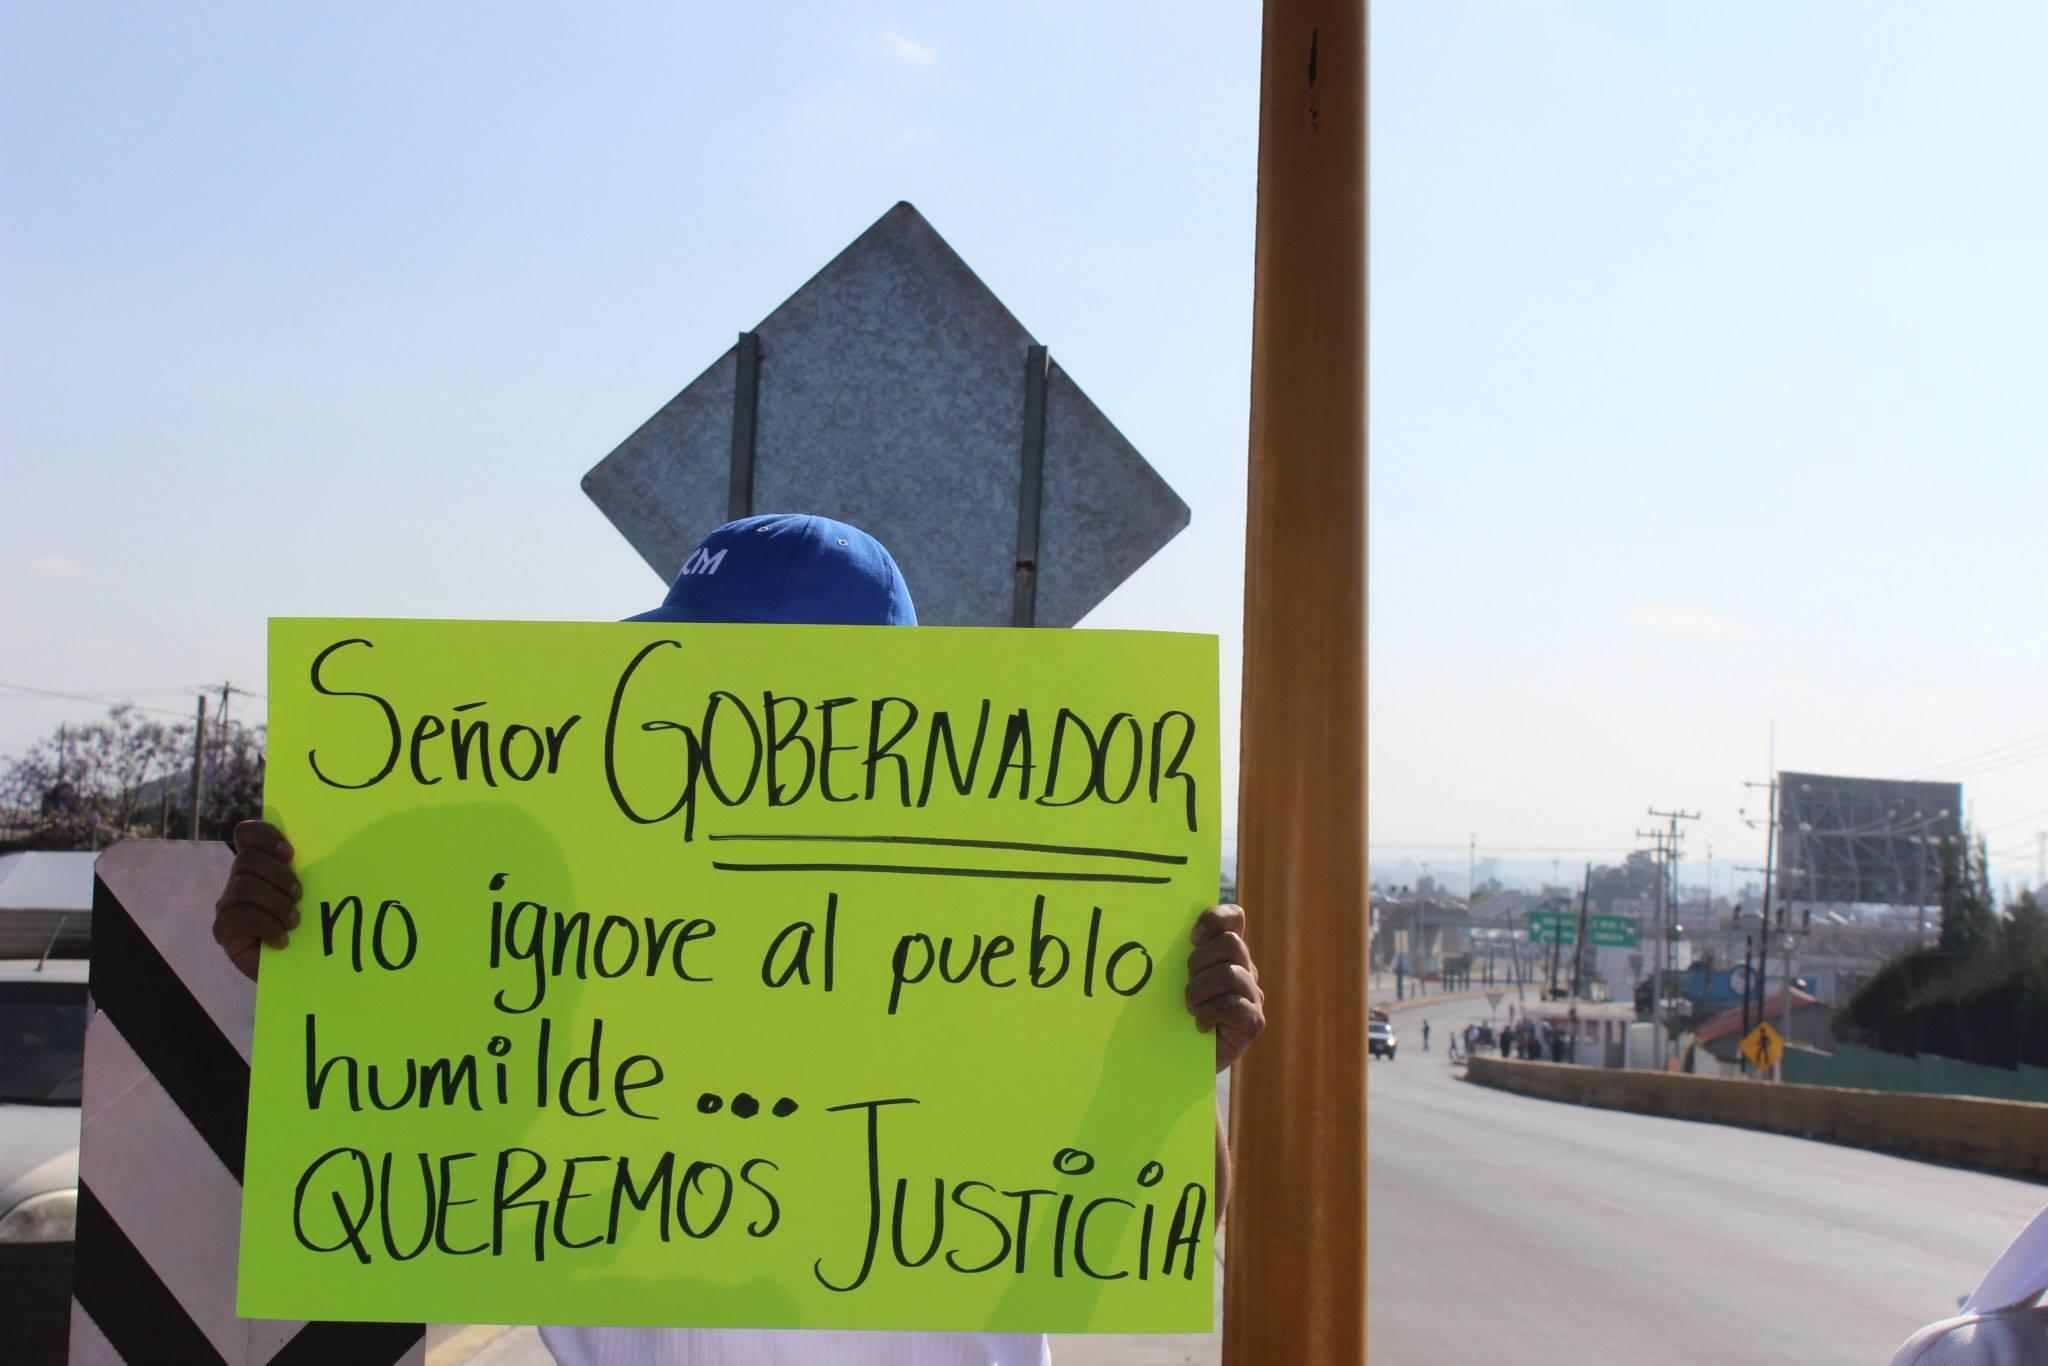 Sr. Gobernador, queremos Justicia